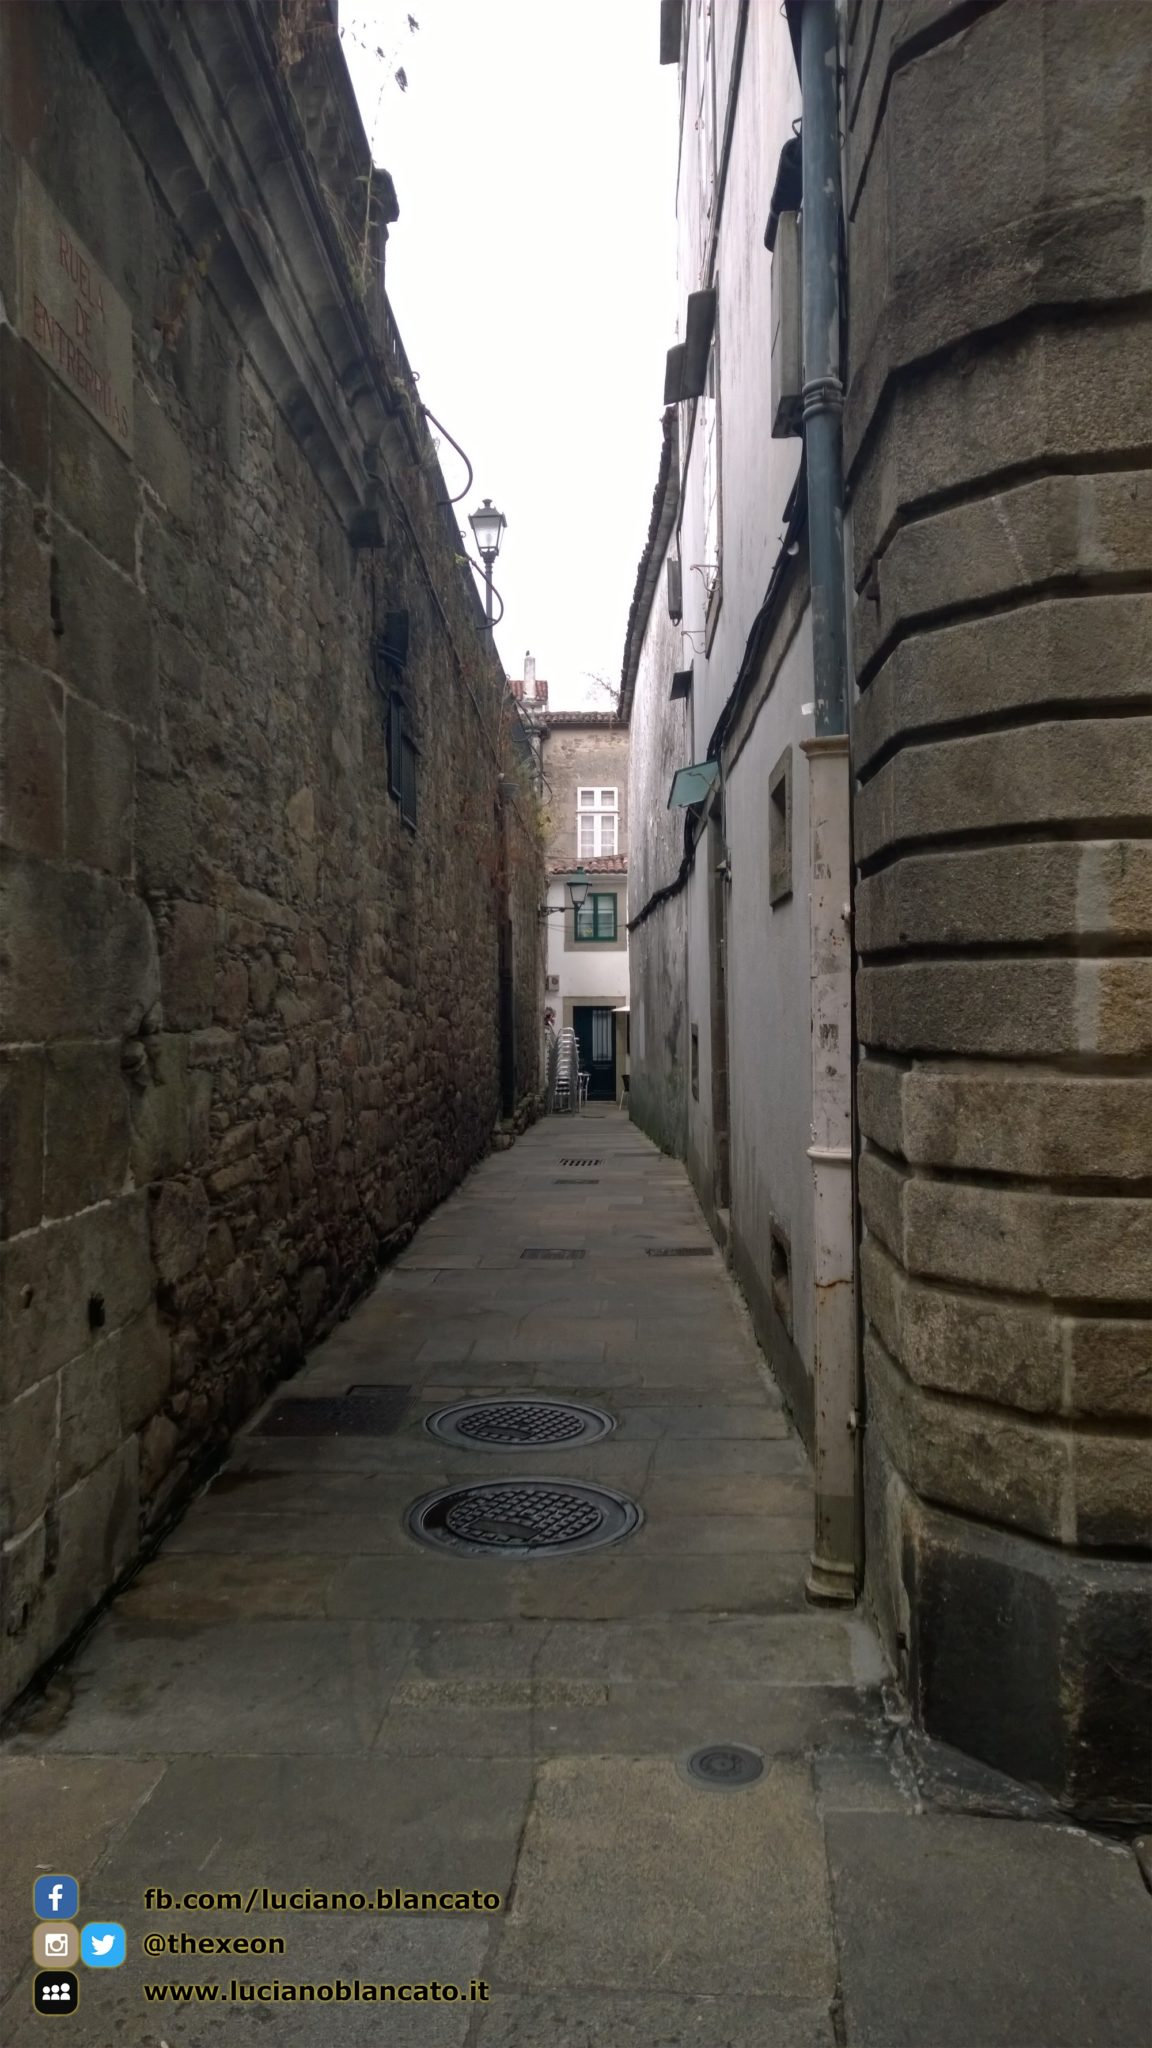 Santiago de Compostela - viuzze del centro